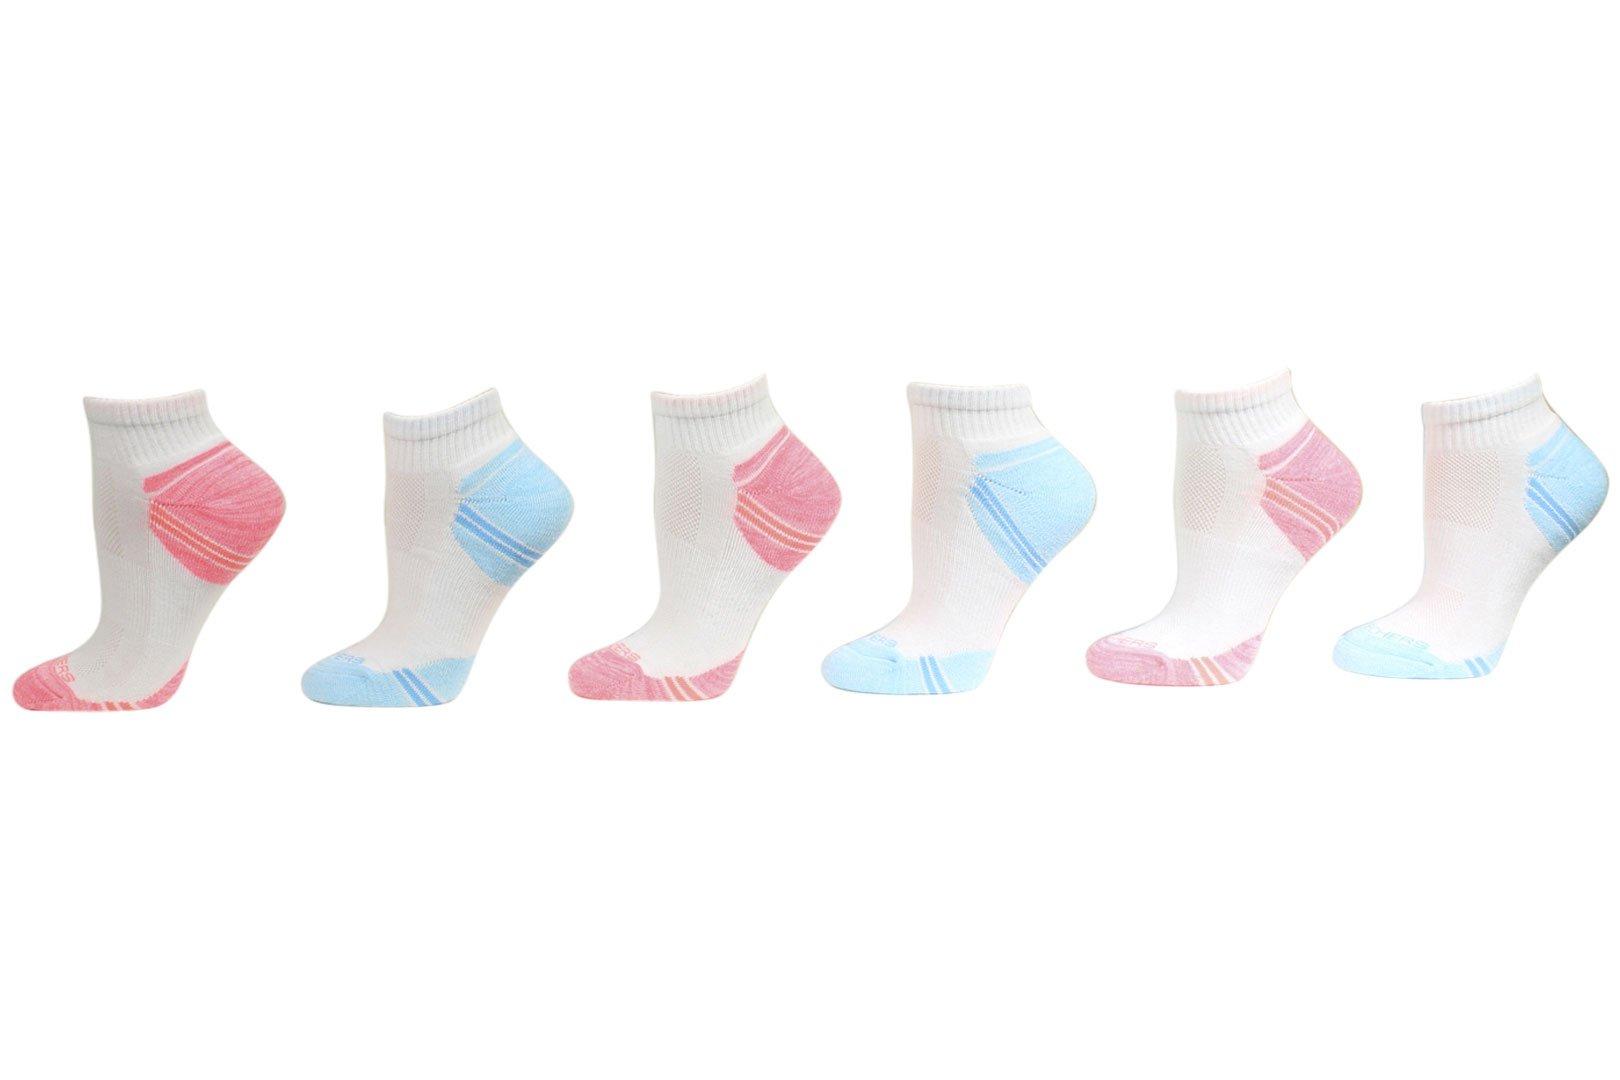 Skechers Women's 6-Pairs White/Blue Quarter Crew Cut Socks Sz: 9-11 Fits 5-9.5